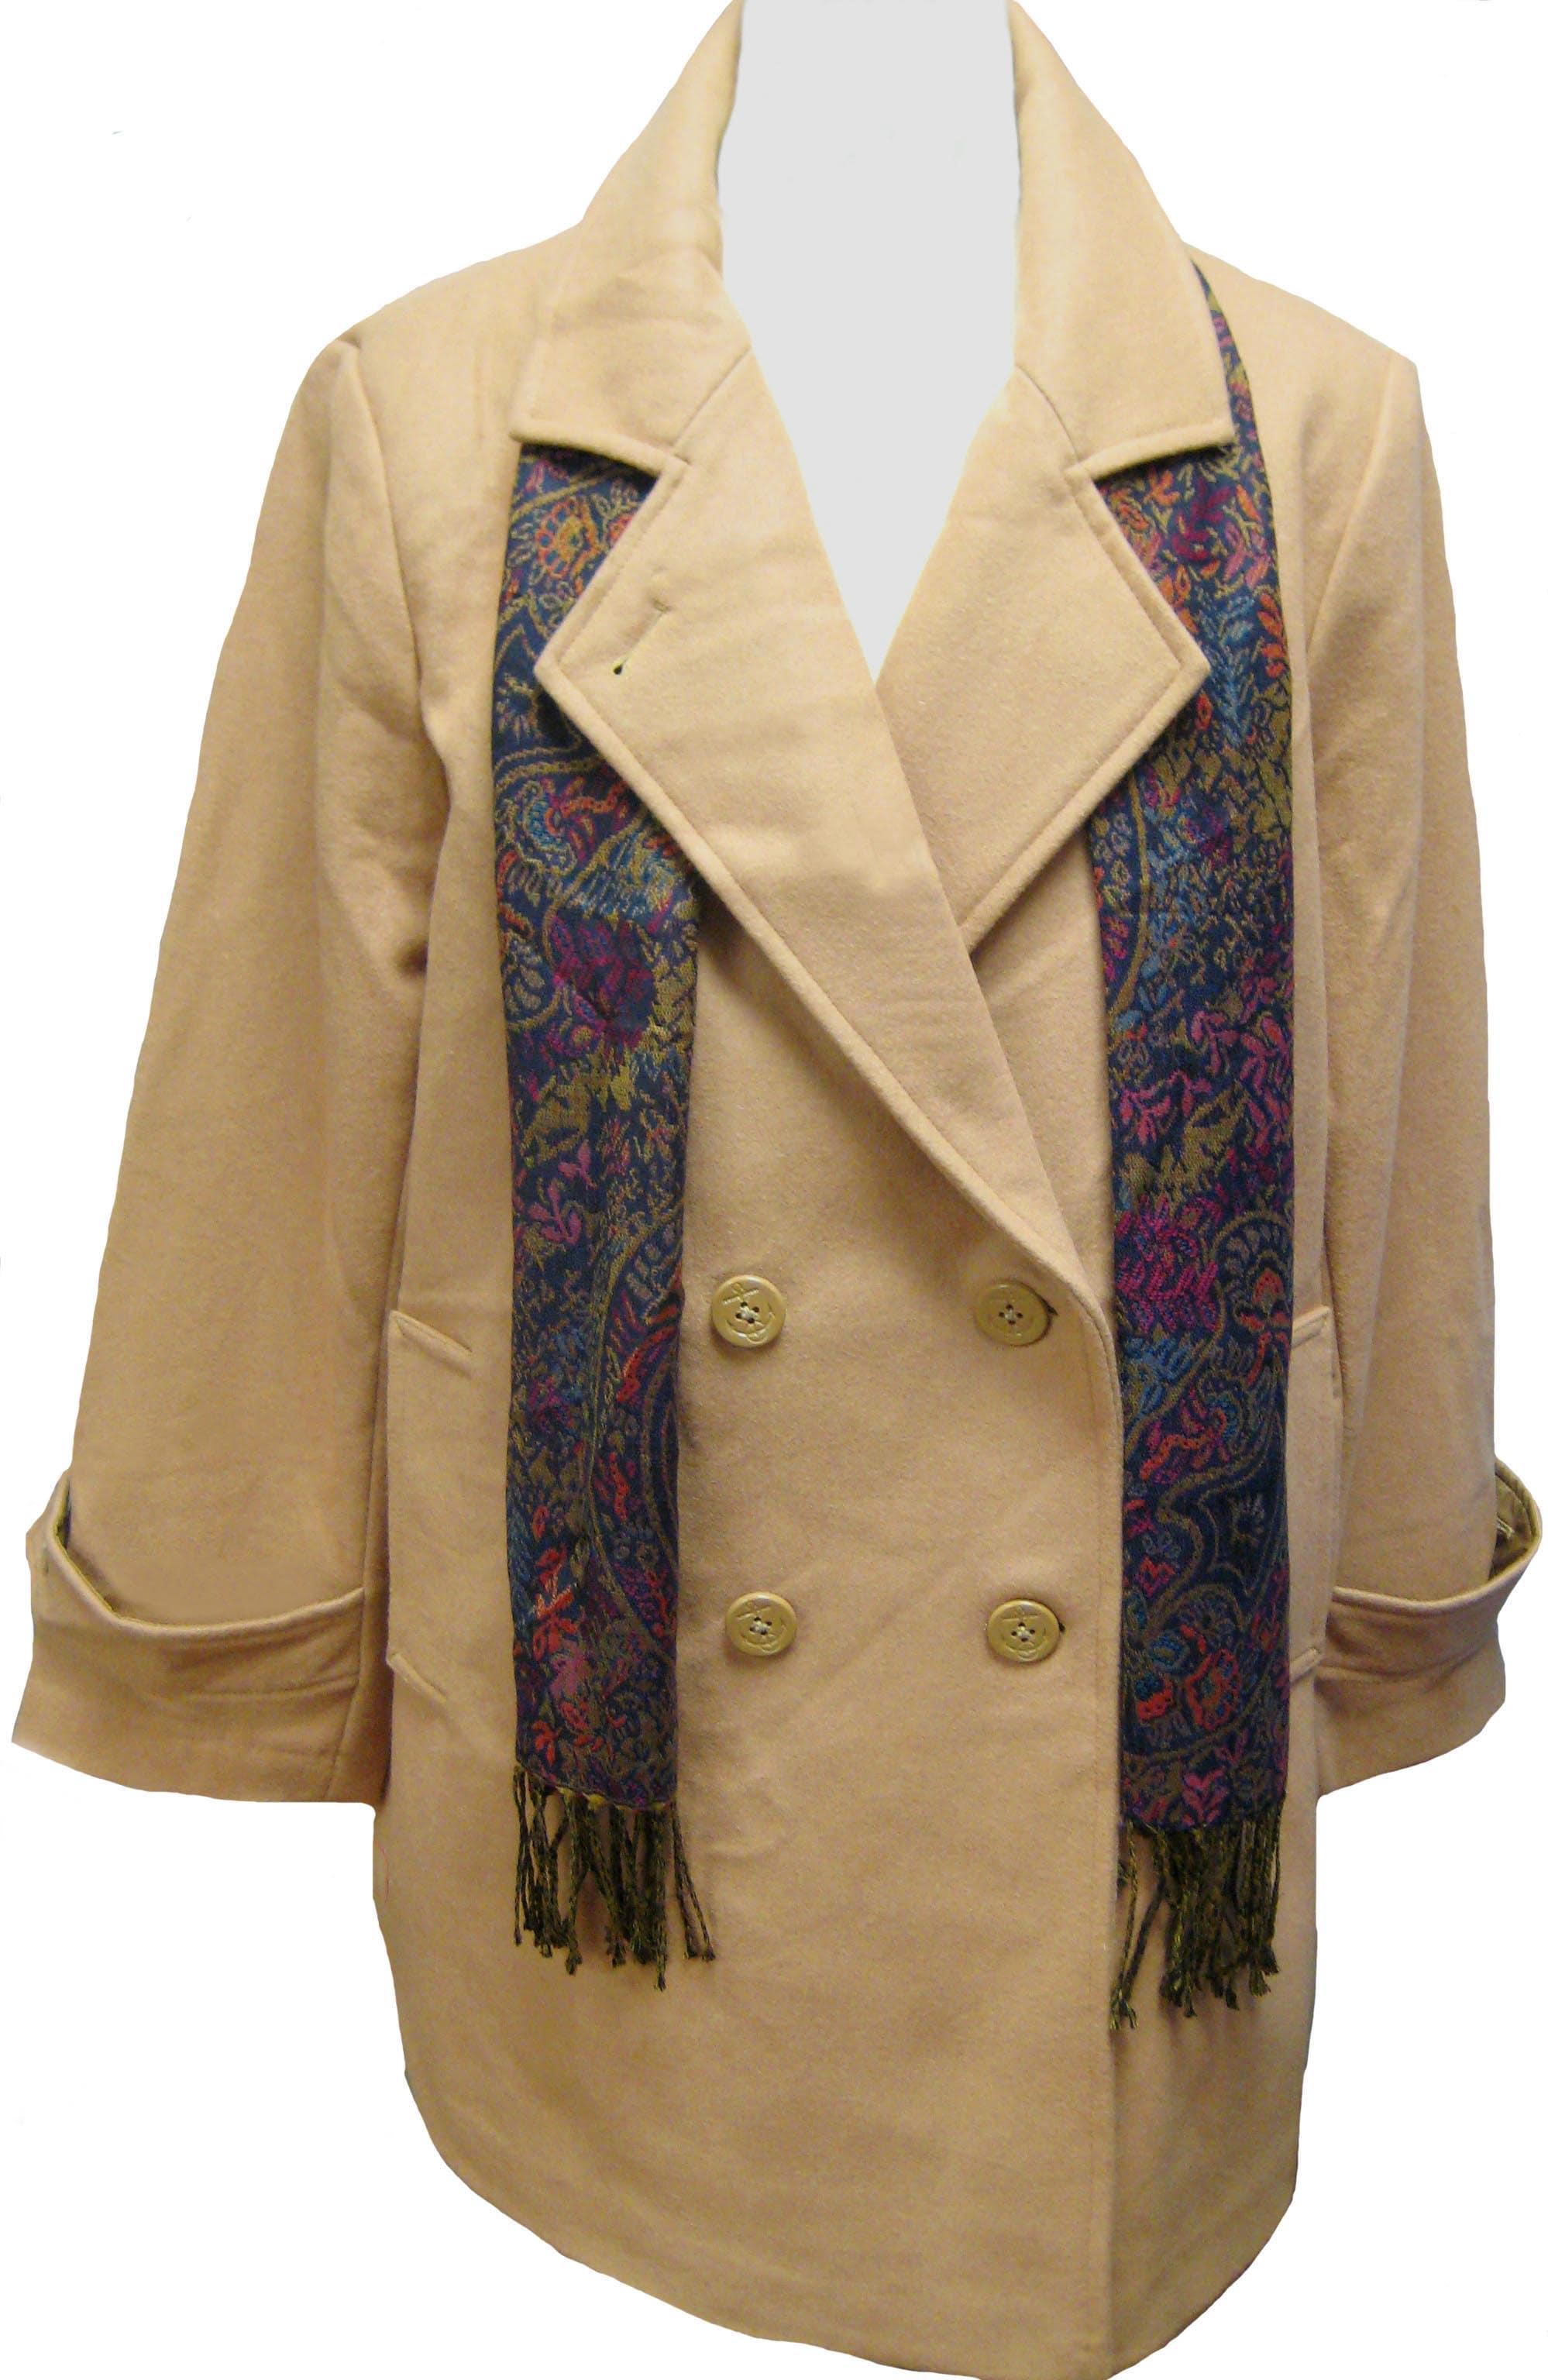 Komitor Women's Plus Size Wool Pea Coat - Thumbnail 1